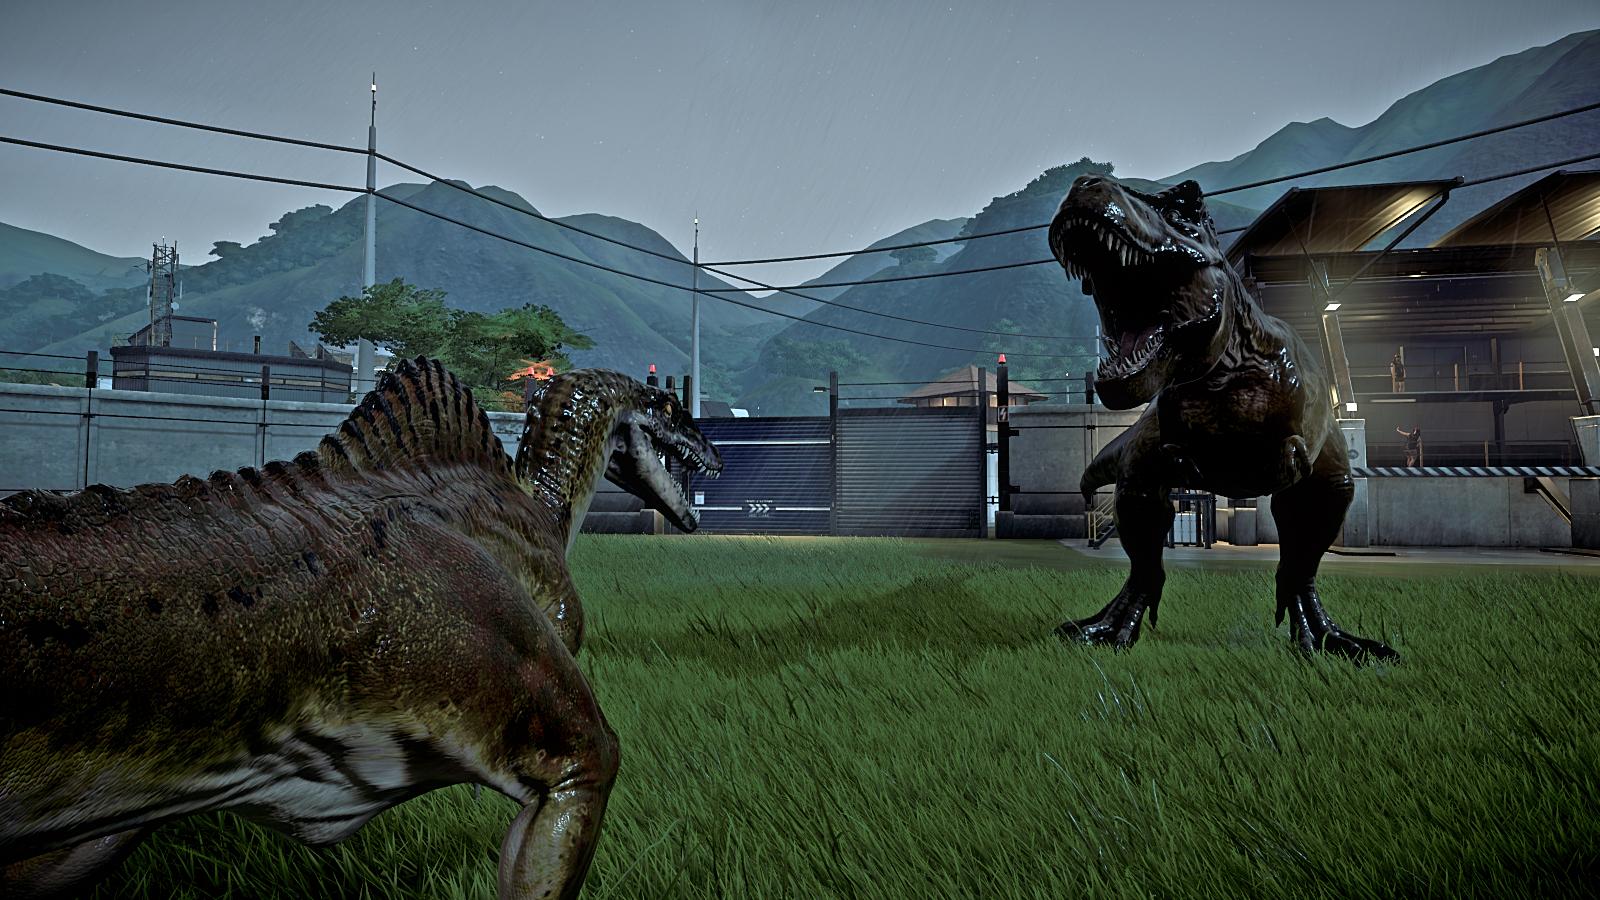 Jurassic World Evolution Spinoraptor - How to Get the